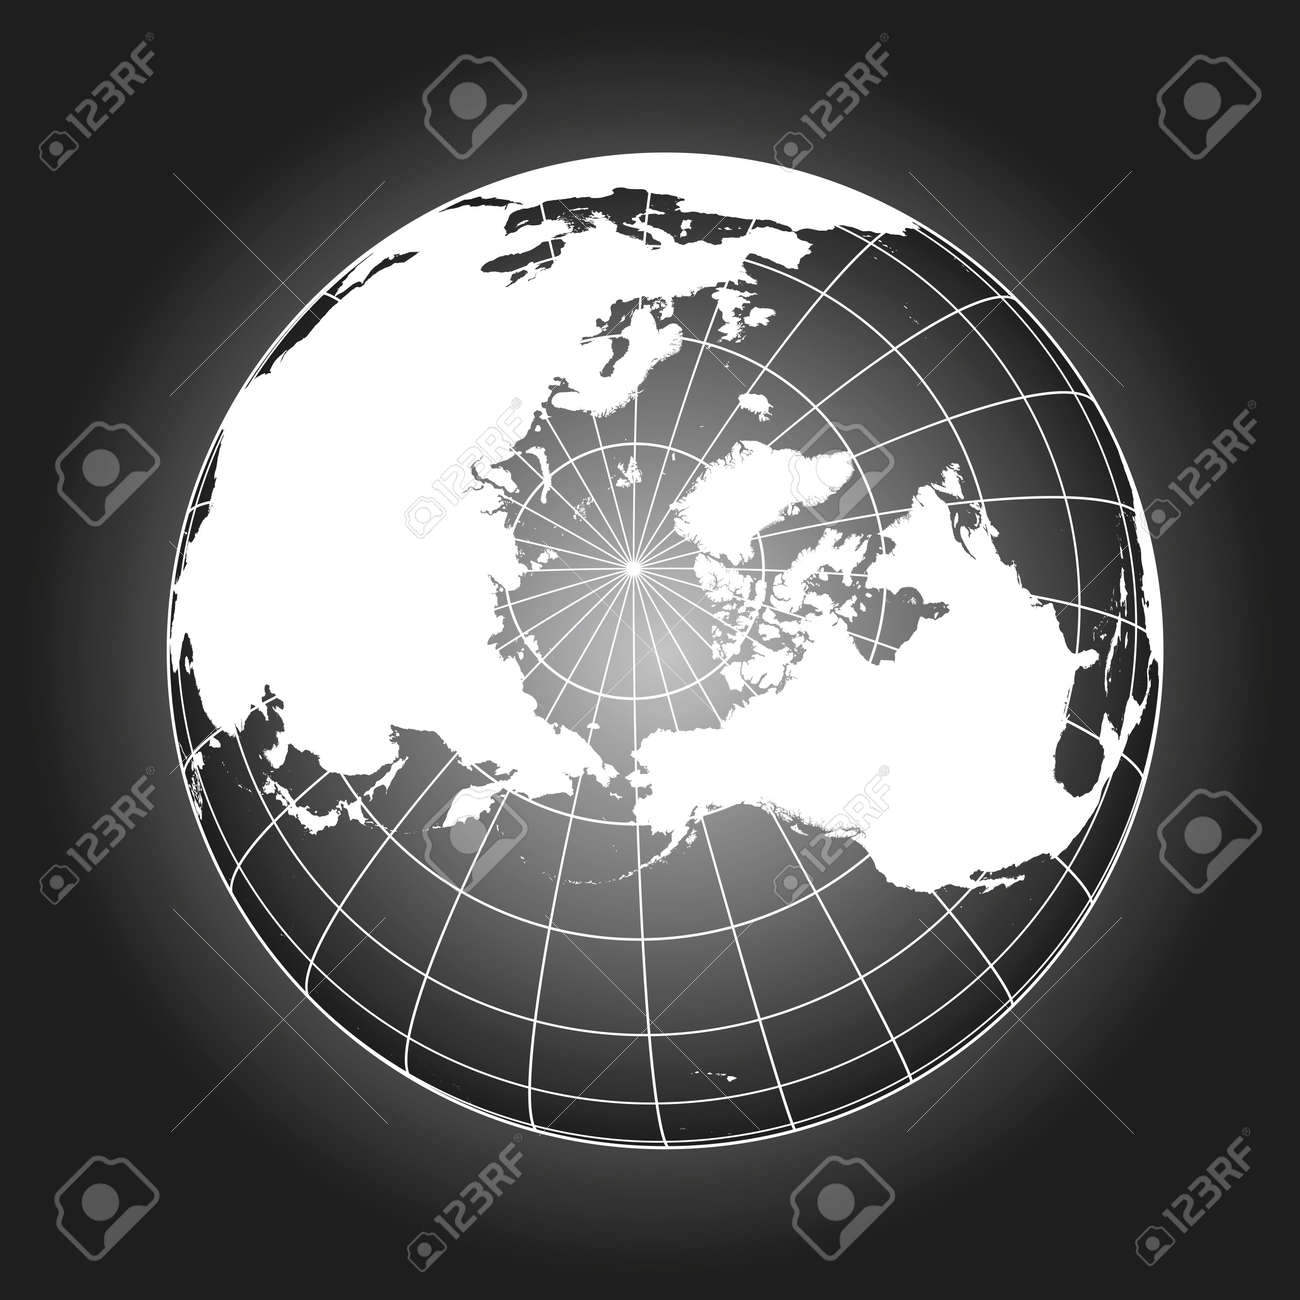 North pole map europe greenland asia america russia earth north pole map europe greenland asia america russia earth globe gumiabroncs Choice Image